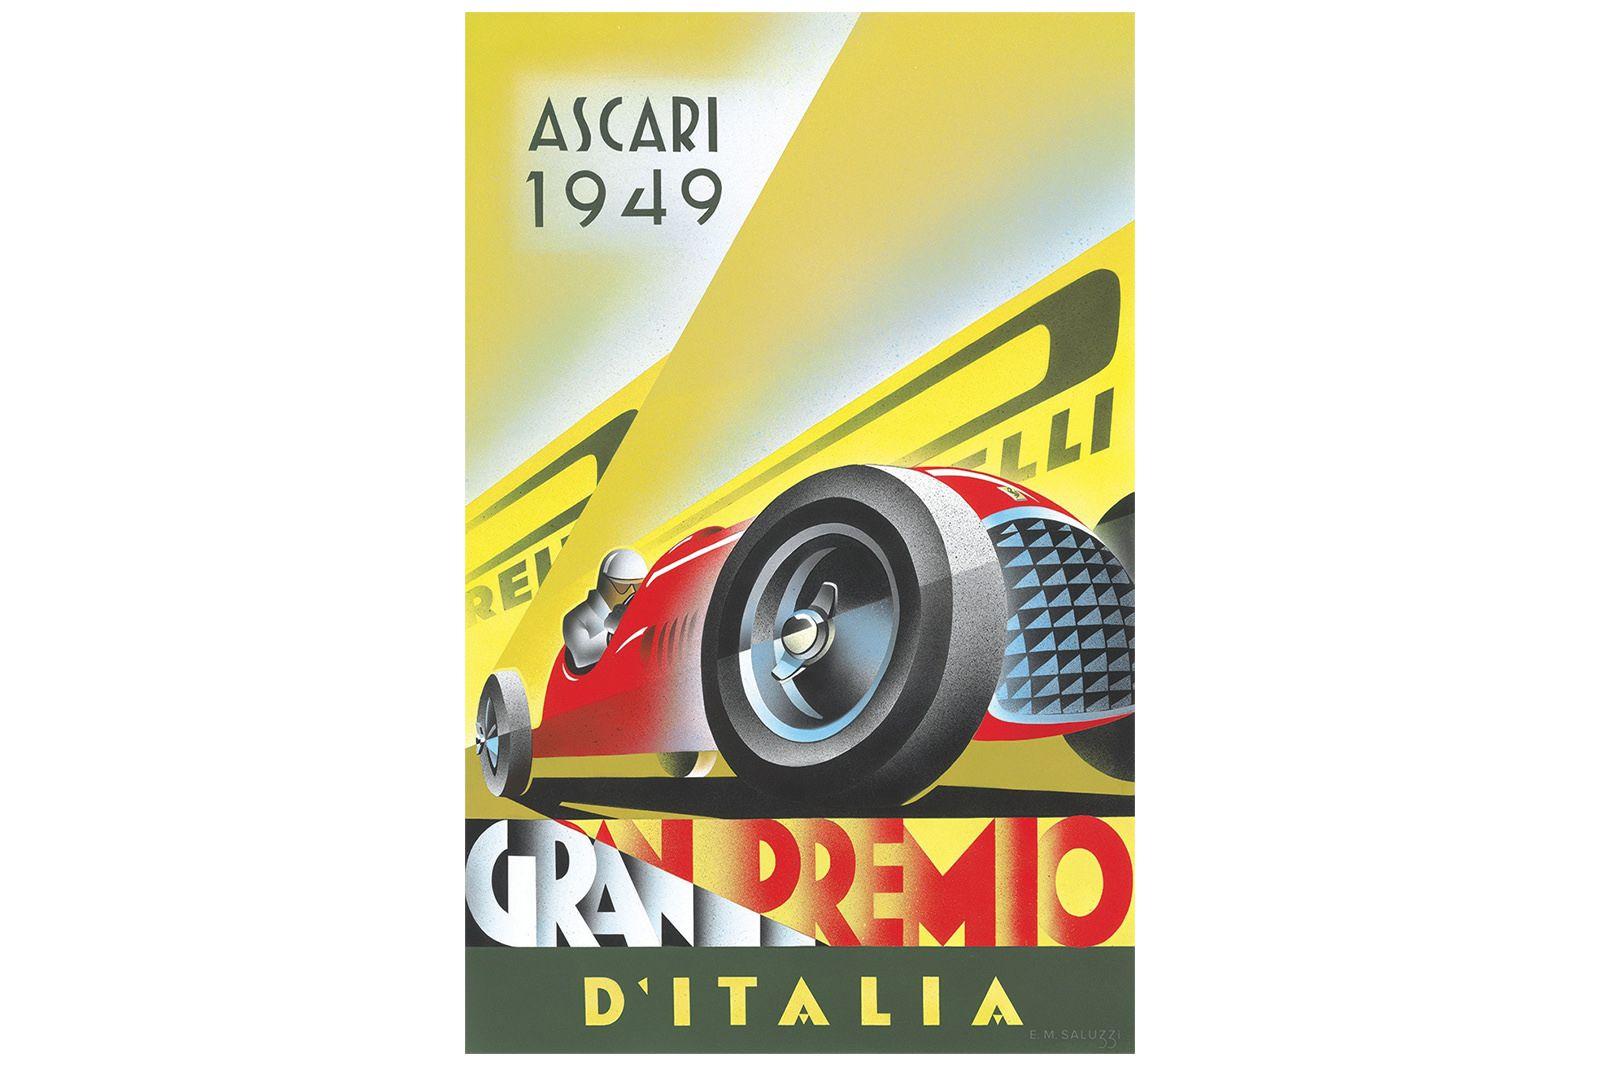 Vinyl Poster - ASCARi 1949 Grand Prix Poster (1.3m by 2m)